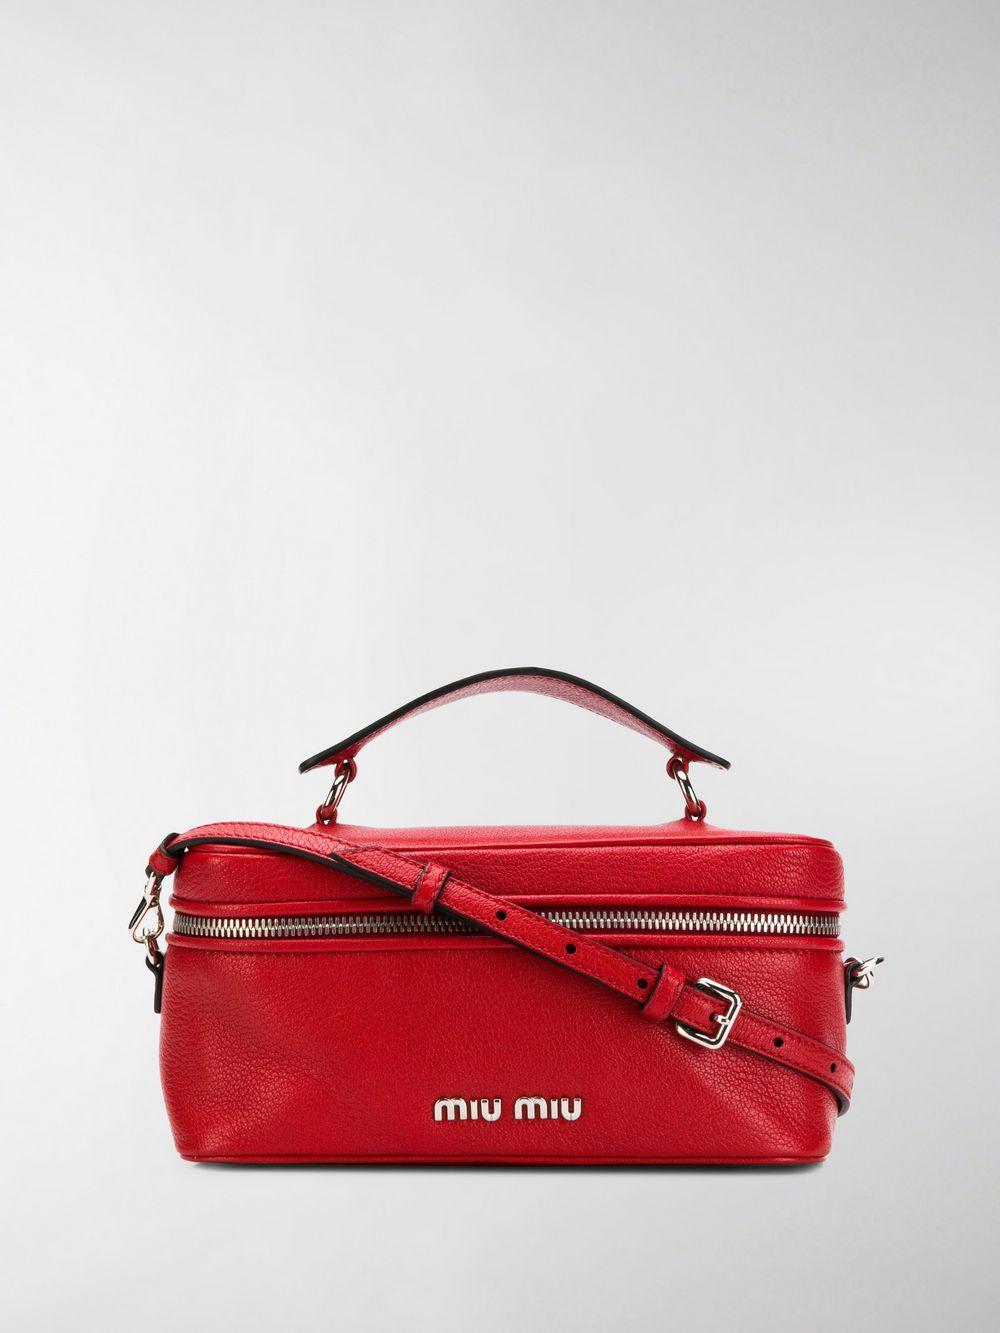 fd8671b19603 Miu Miu Top Handle Shoulder Bag in Red - Lyst